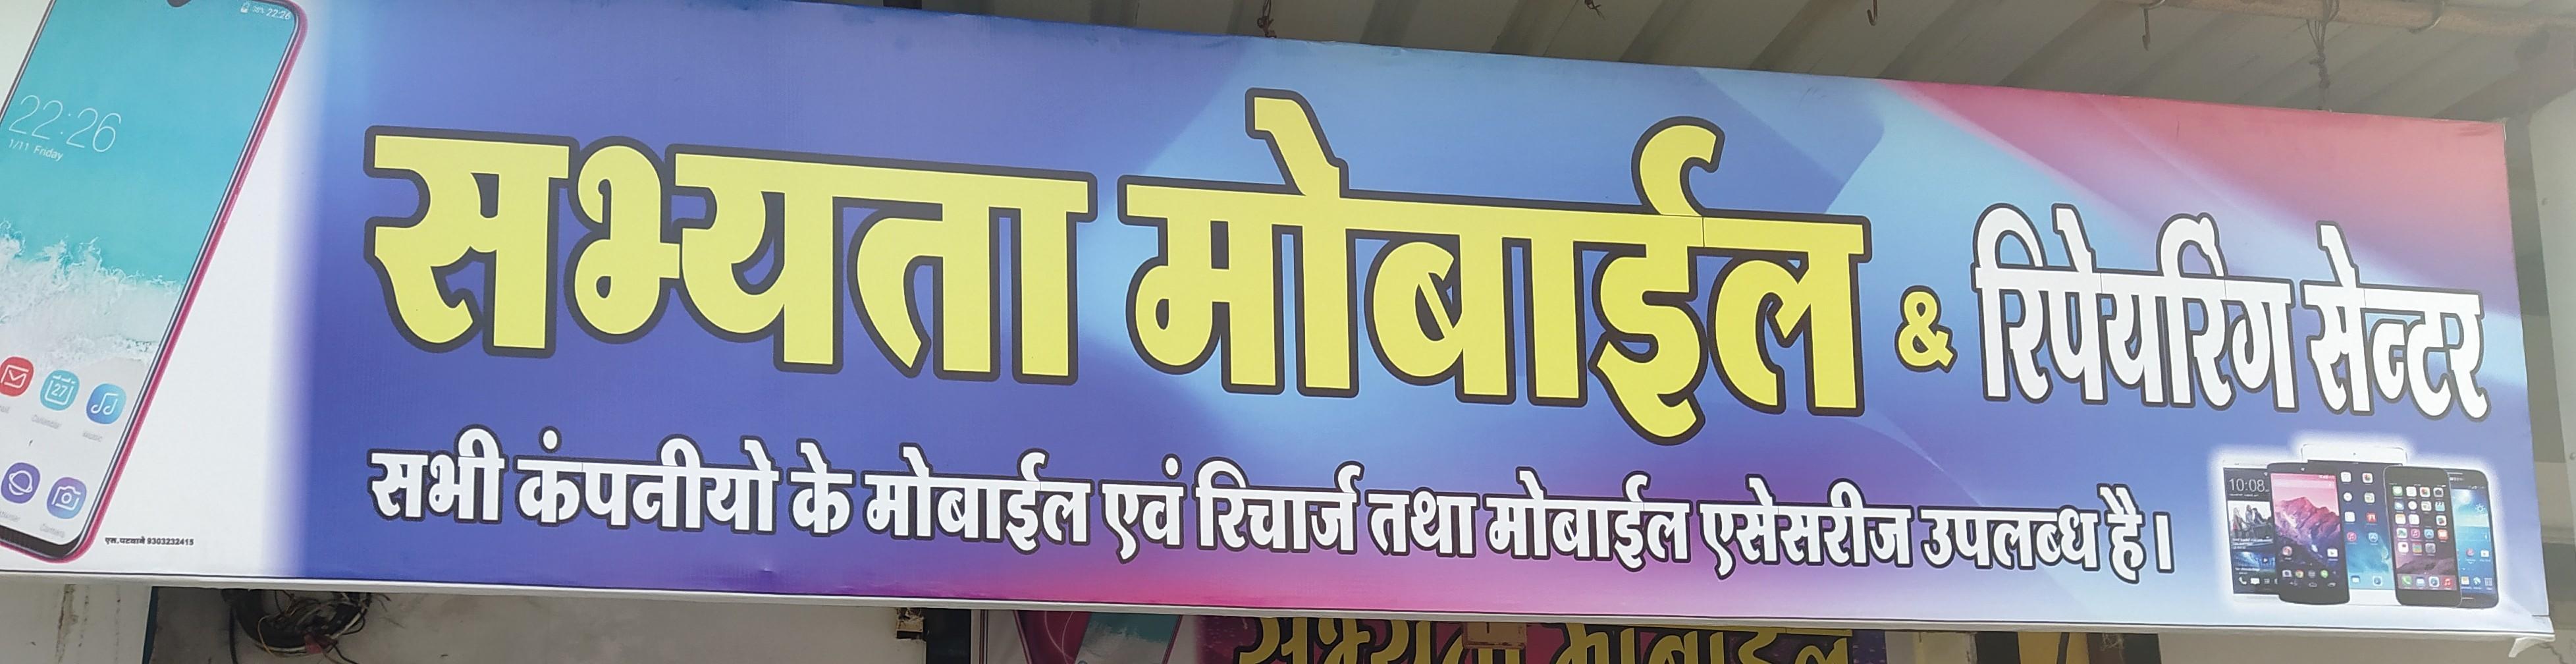 Shabhayta mobile shop